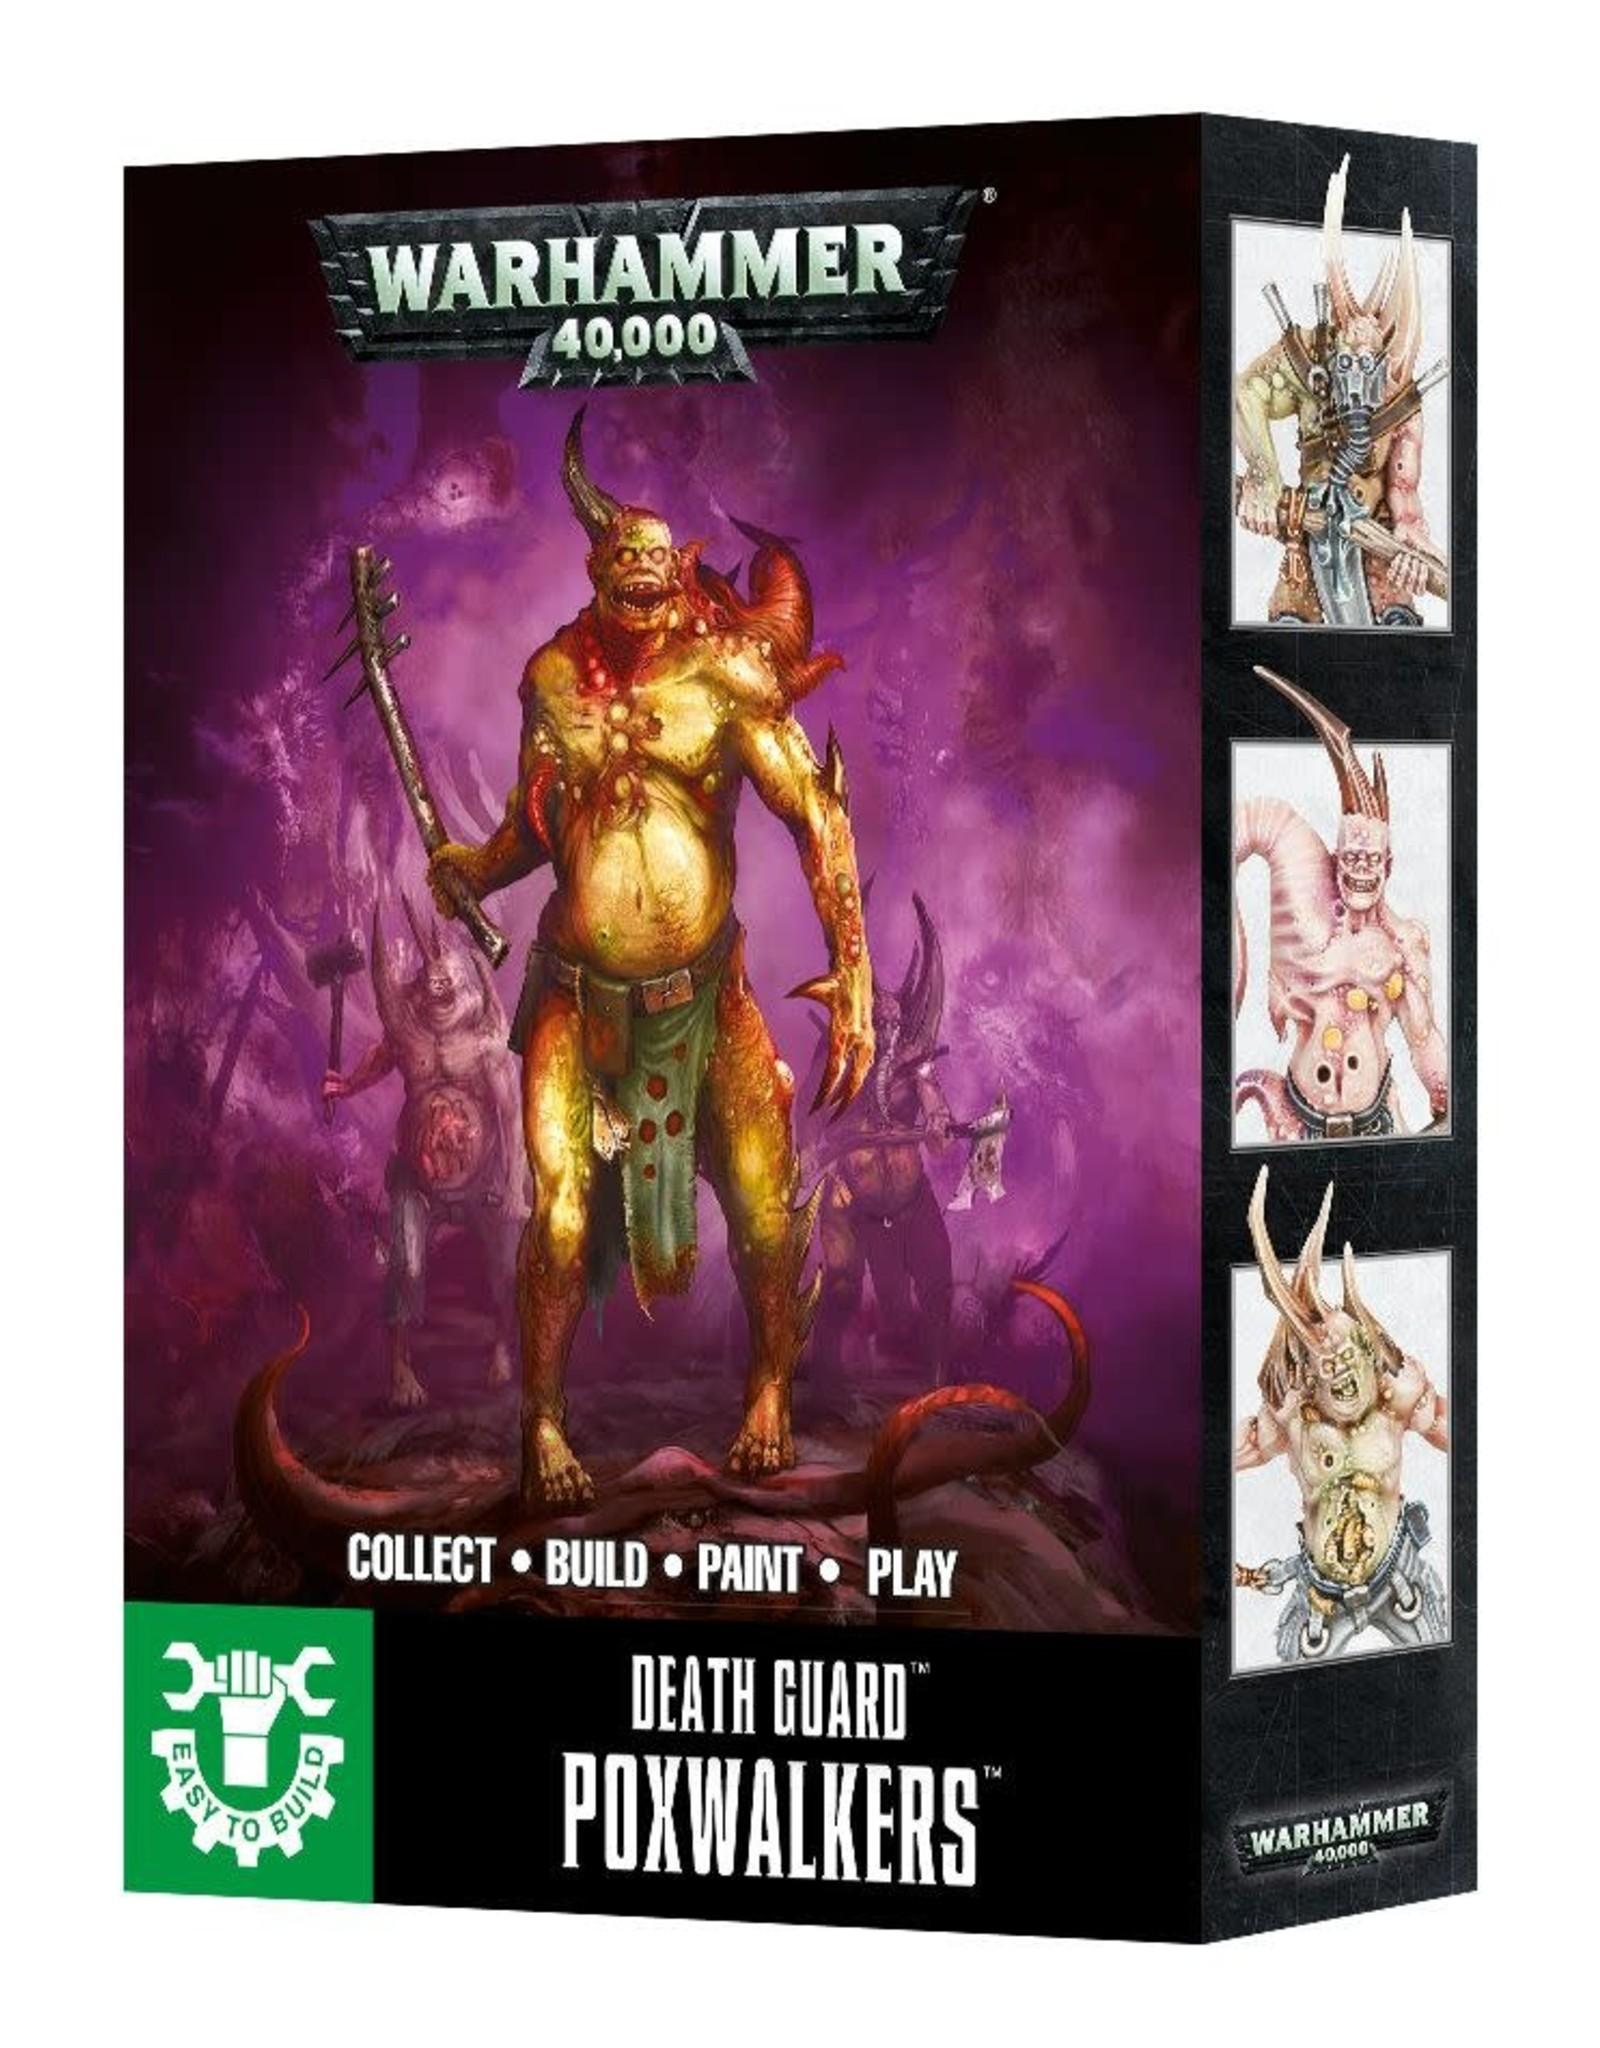 Warhammer 40K ETB: Death Guard Poxwalkers